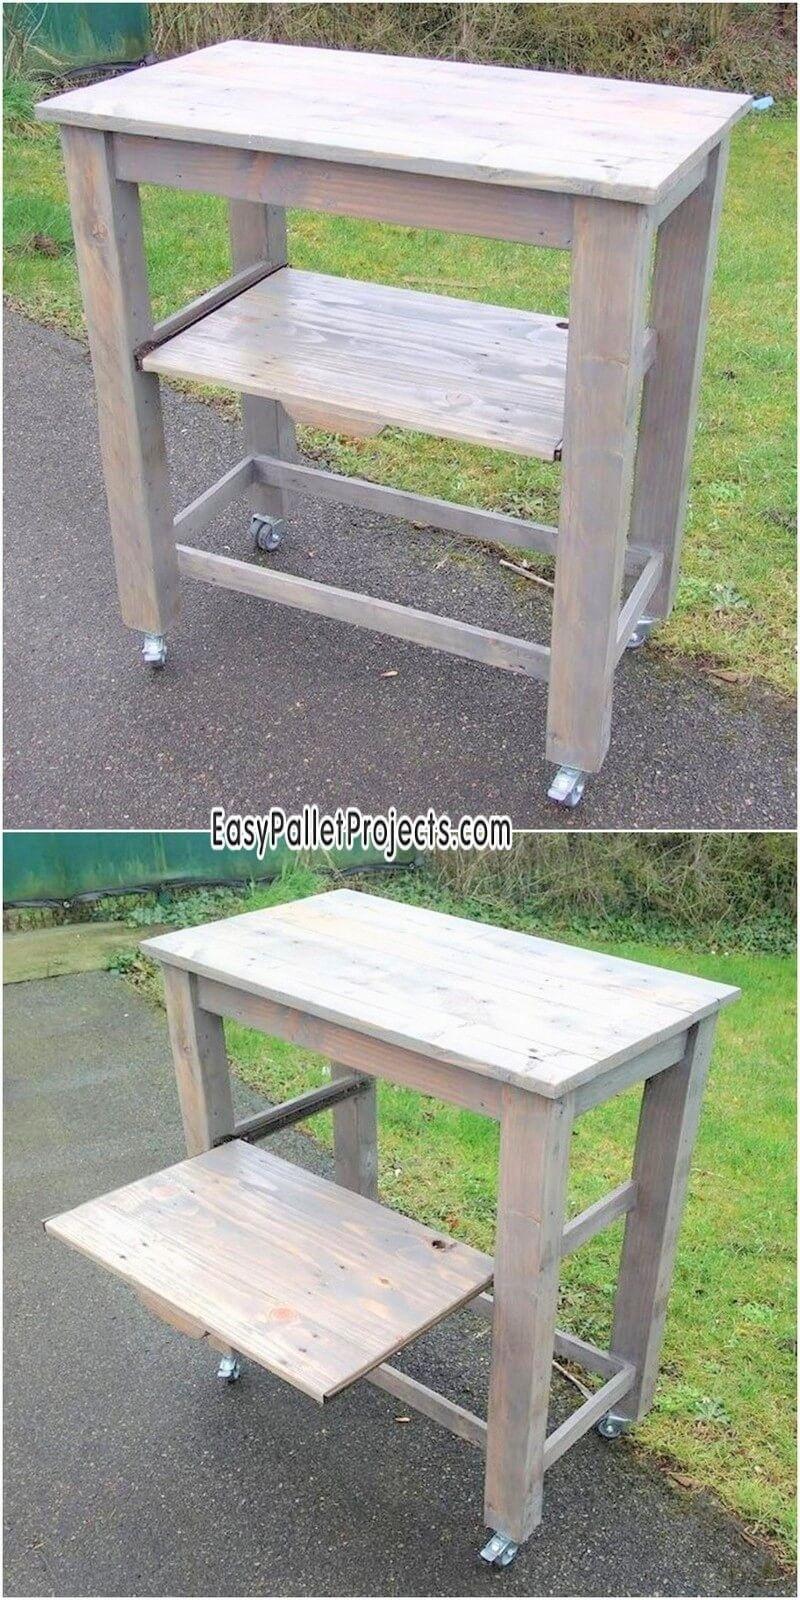 Fabulous Diy Pallet Projects Pallet Garden Furniture Pallet Diy